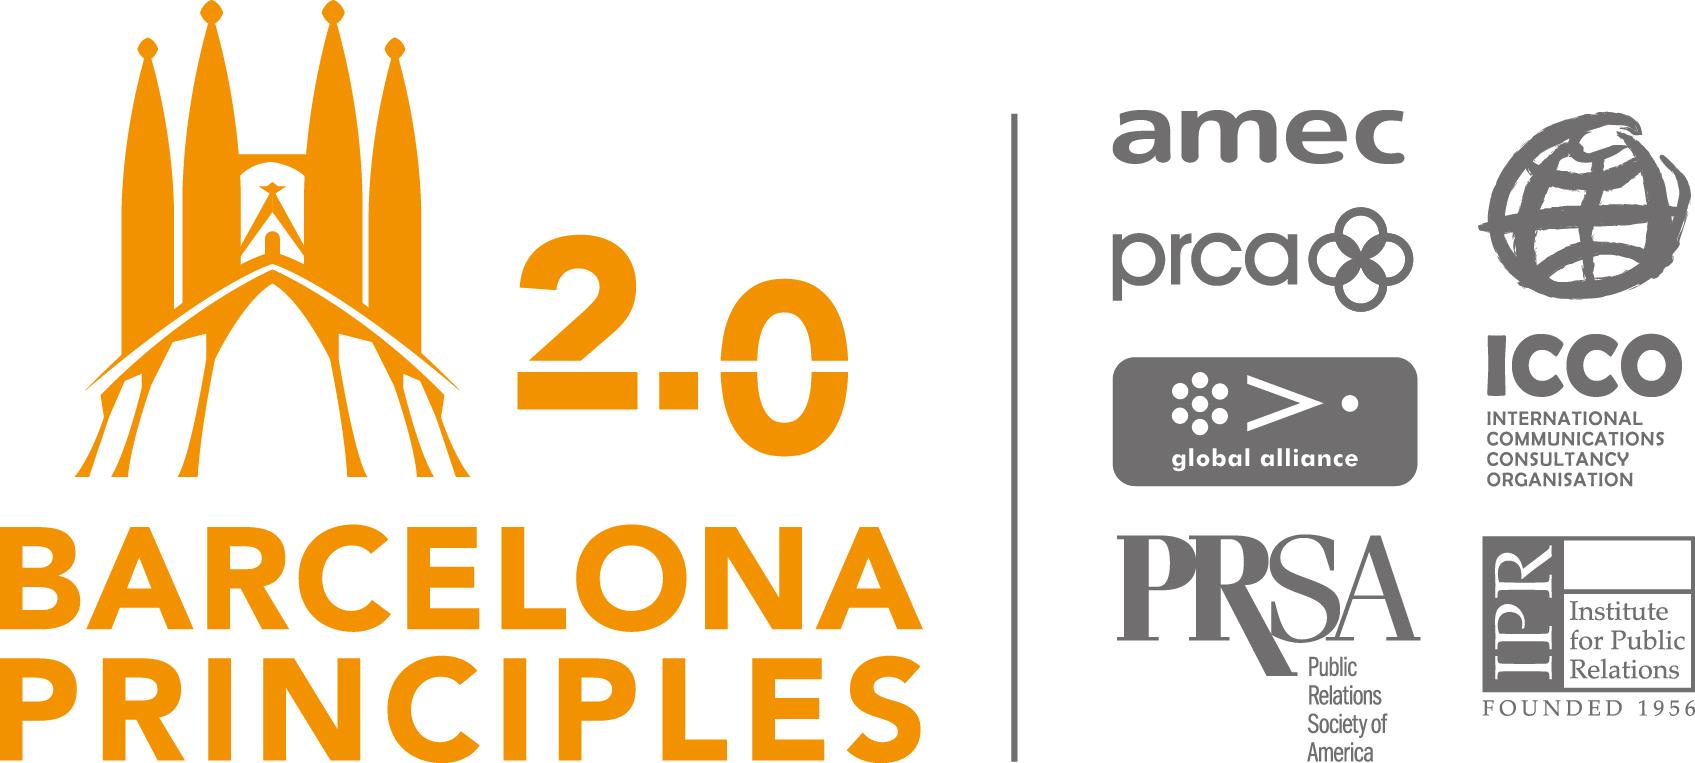 3109-Barcelona-Principles-2-Logo